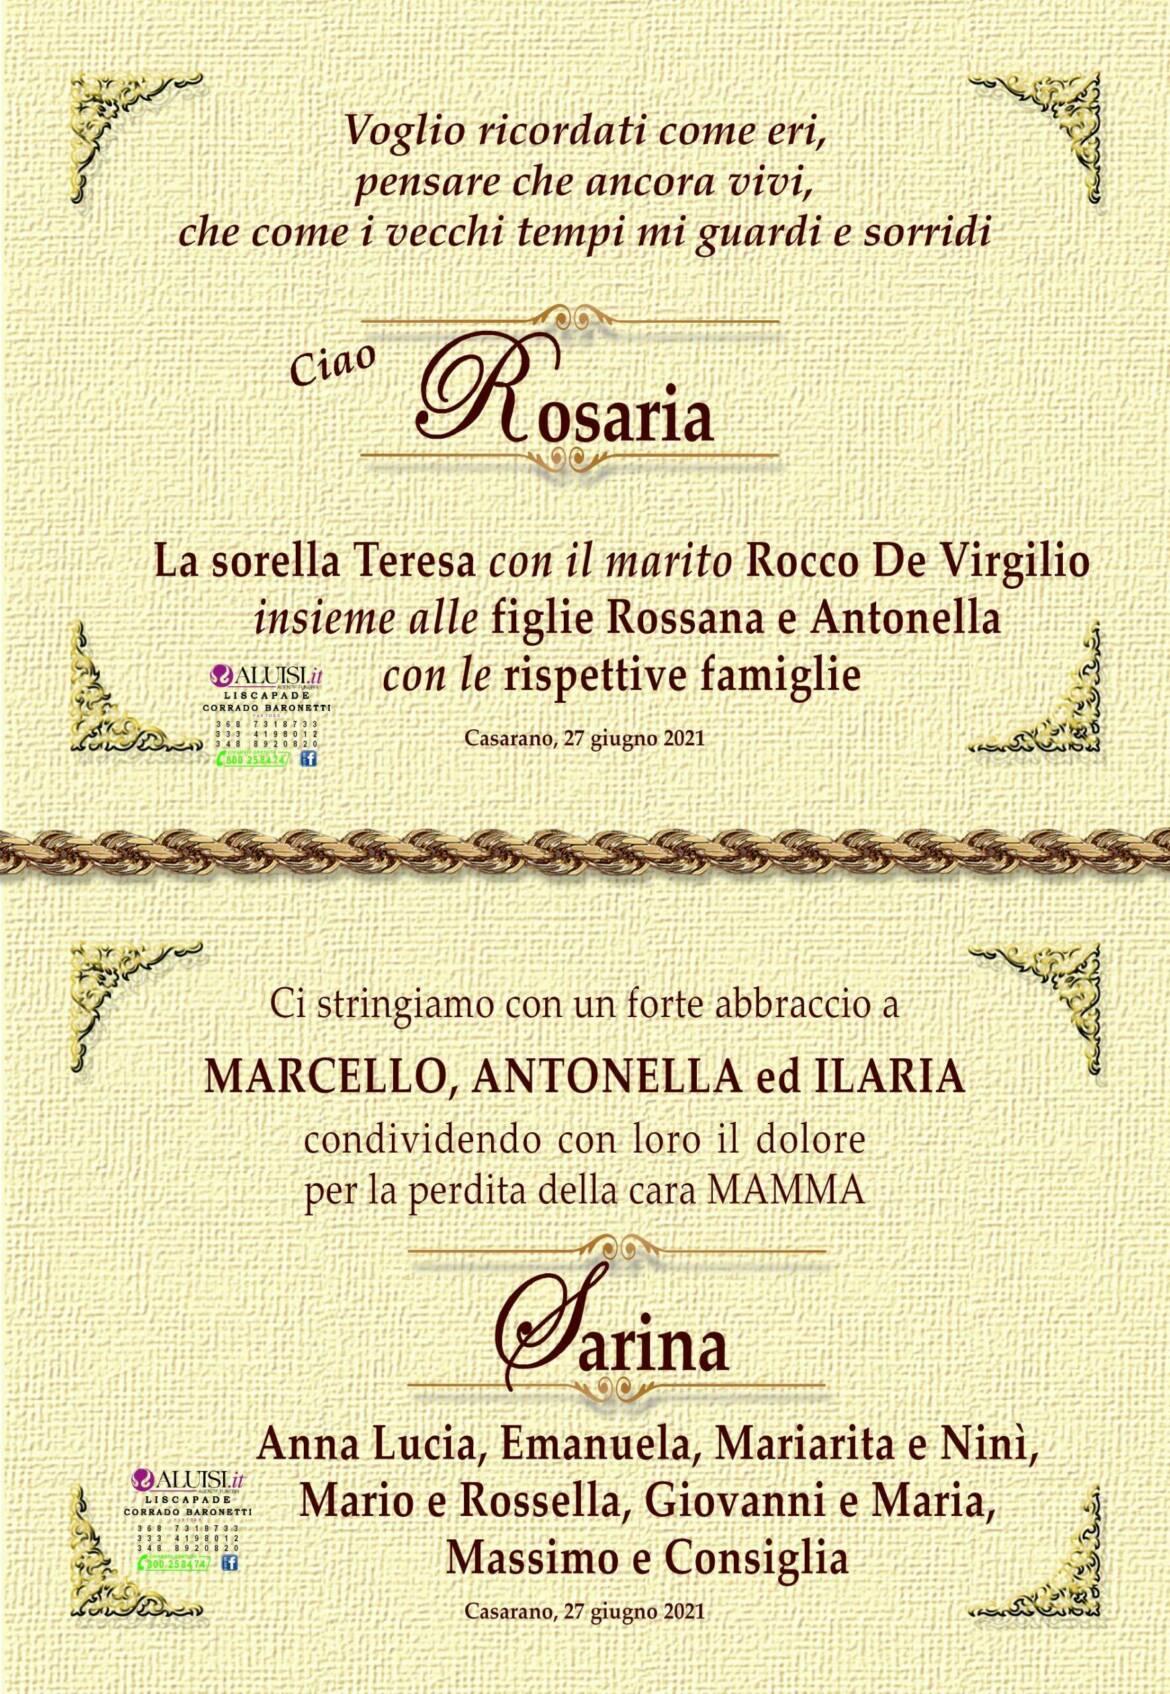 partceipazioni-rosaria-casarano-1-1-scaled.jpg